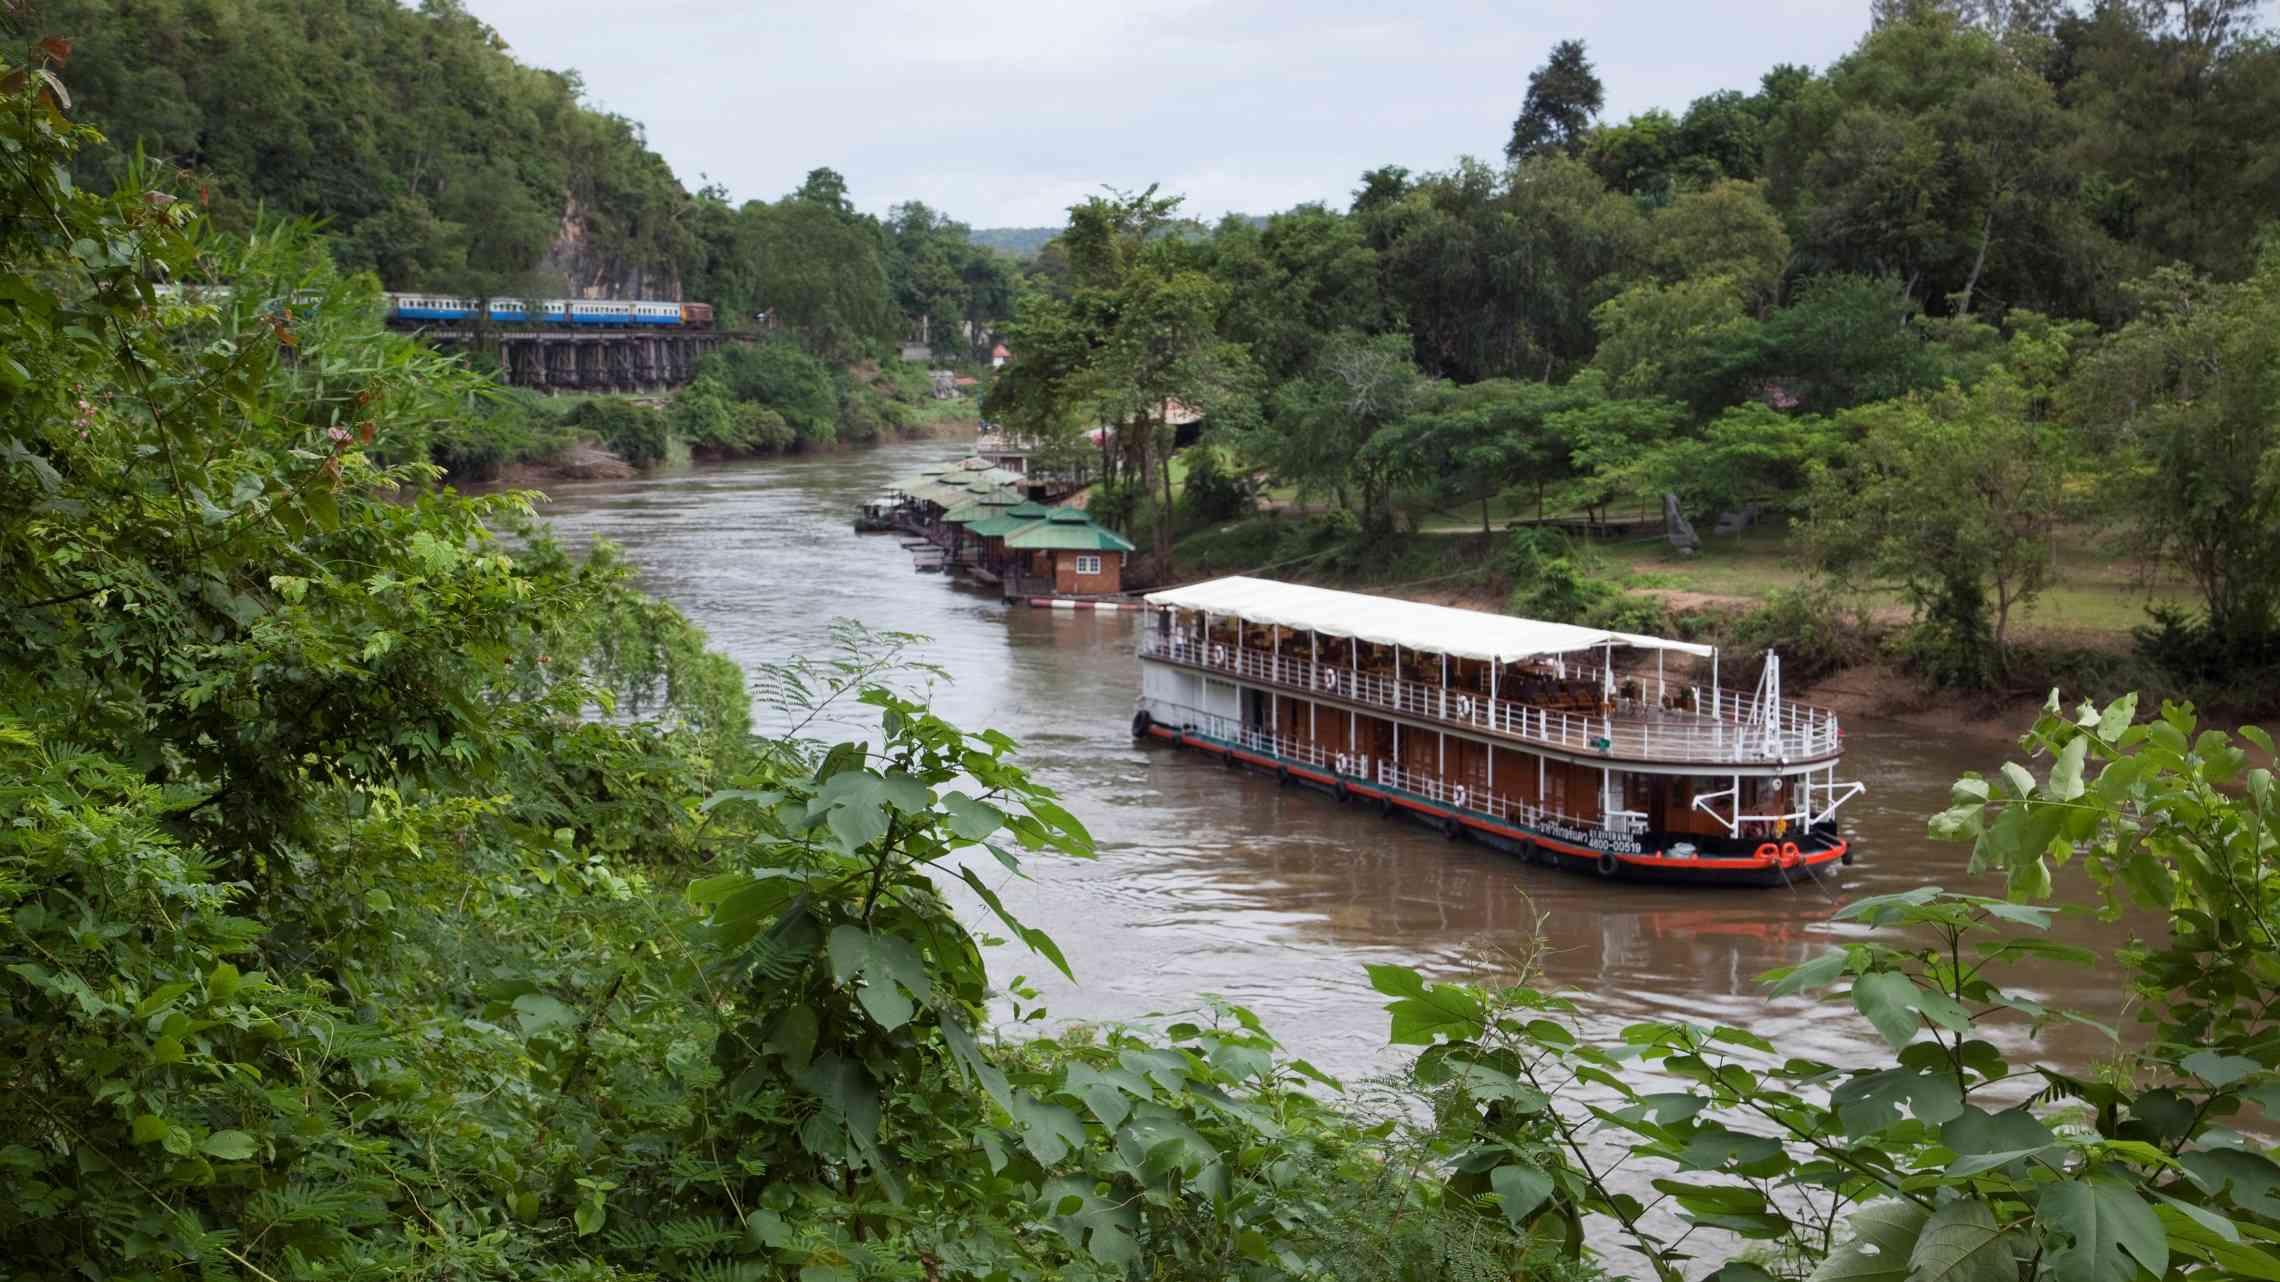 River-Kwai-yleiskuva2-©Holger-Leue-1920x1080.jpg